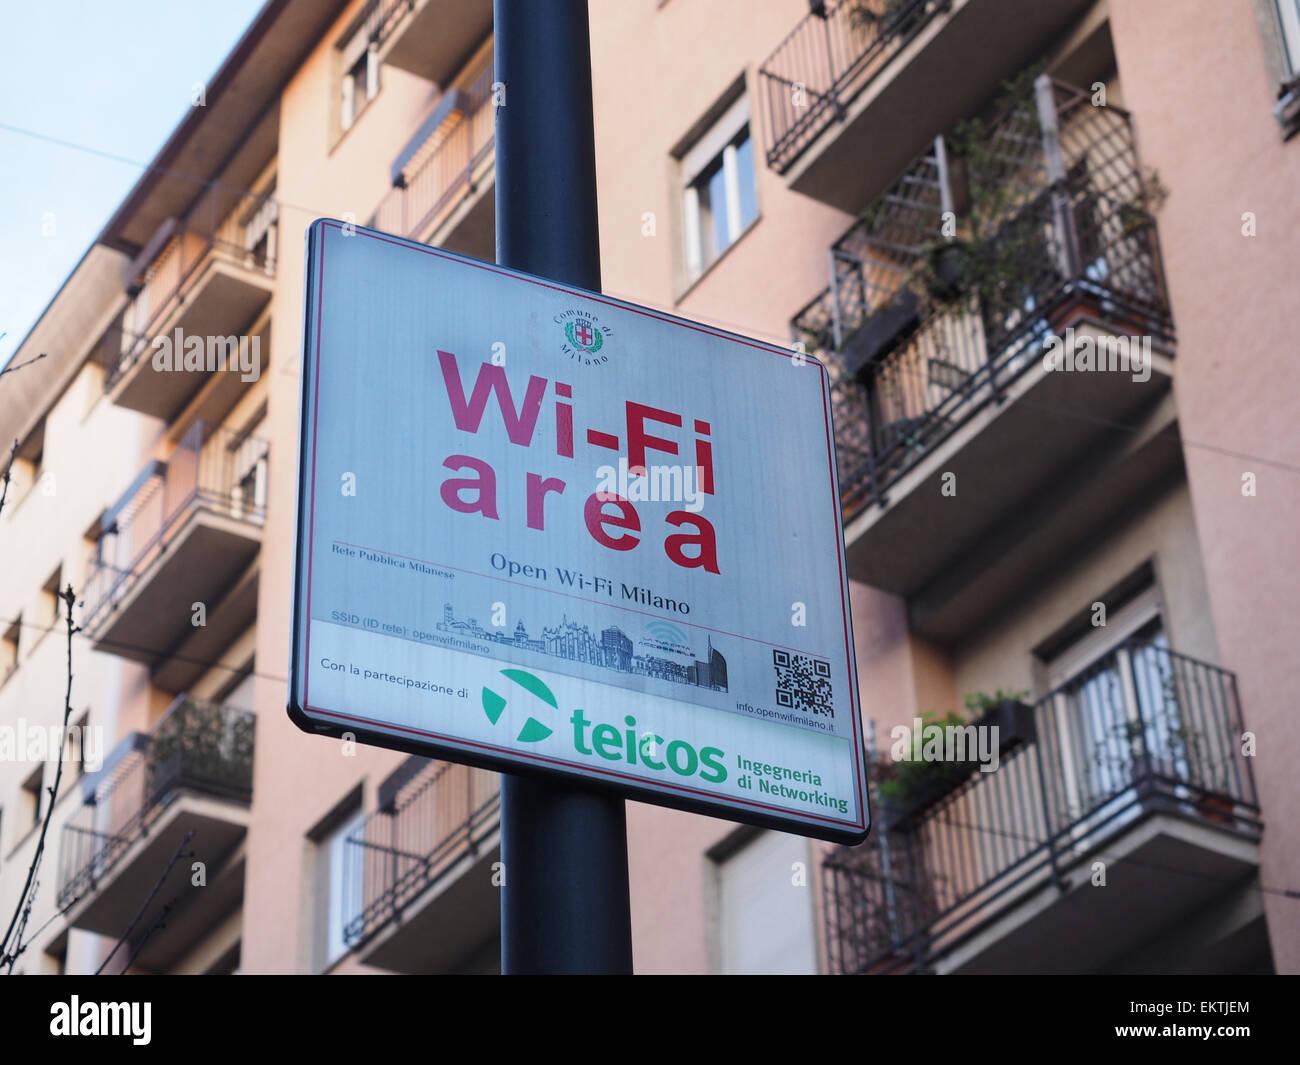 Zone Wi-Fi signe, Corso Garibaldi street, quartier de Brera, Milan, Lombardie, Italie, Europe Photo Stock